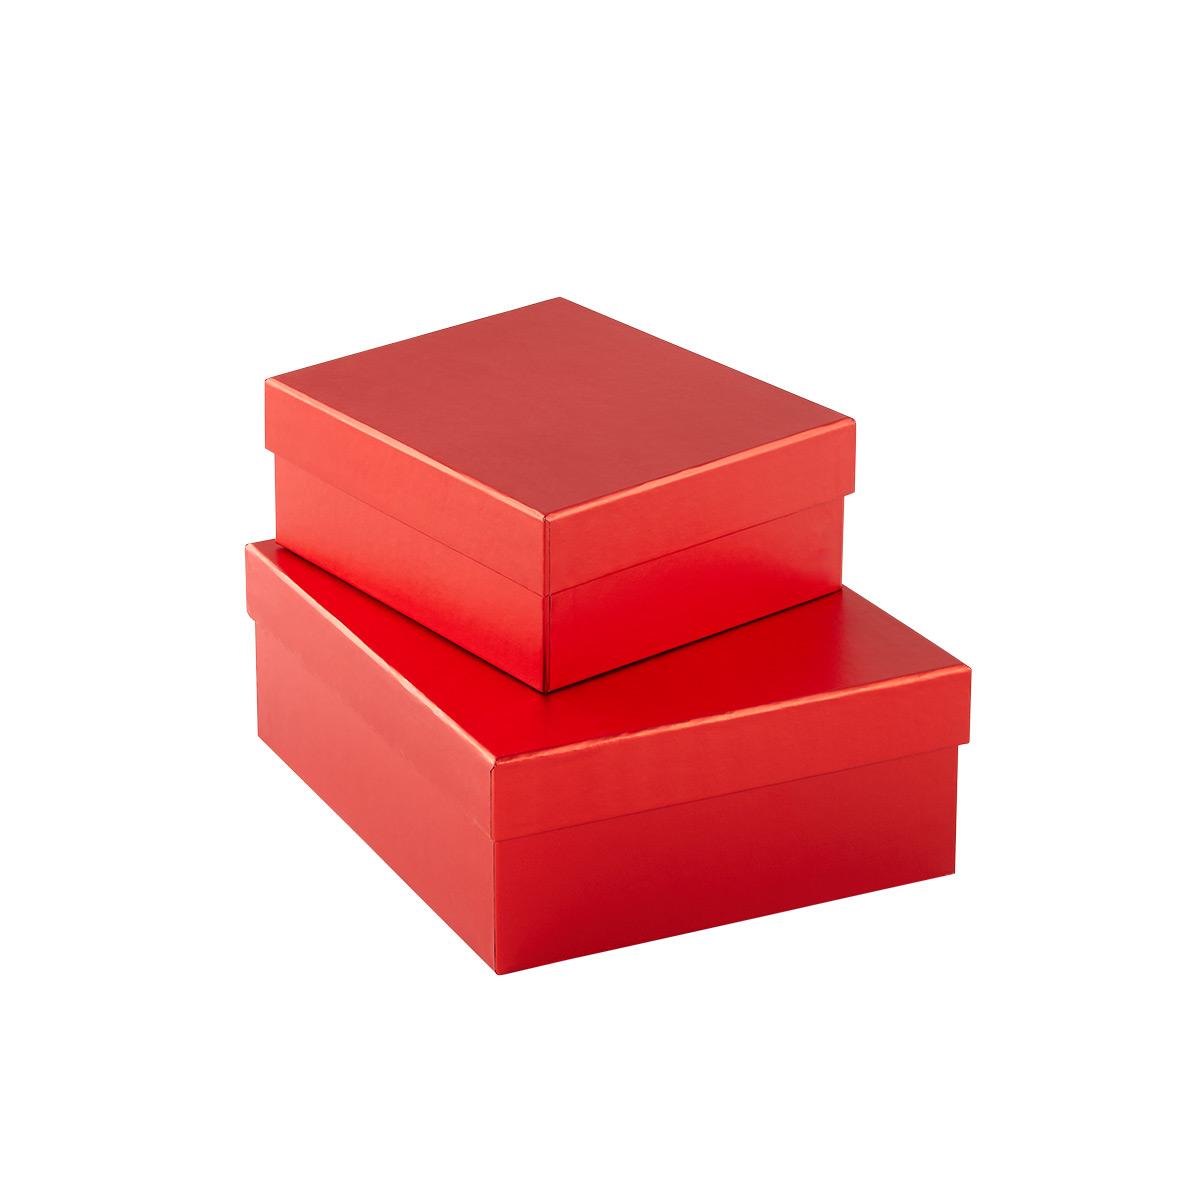 Metallic Red Gift Boxes